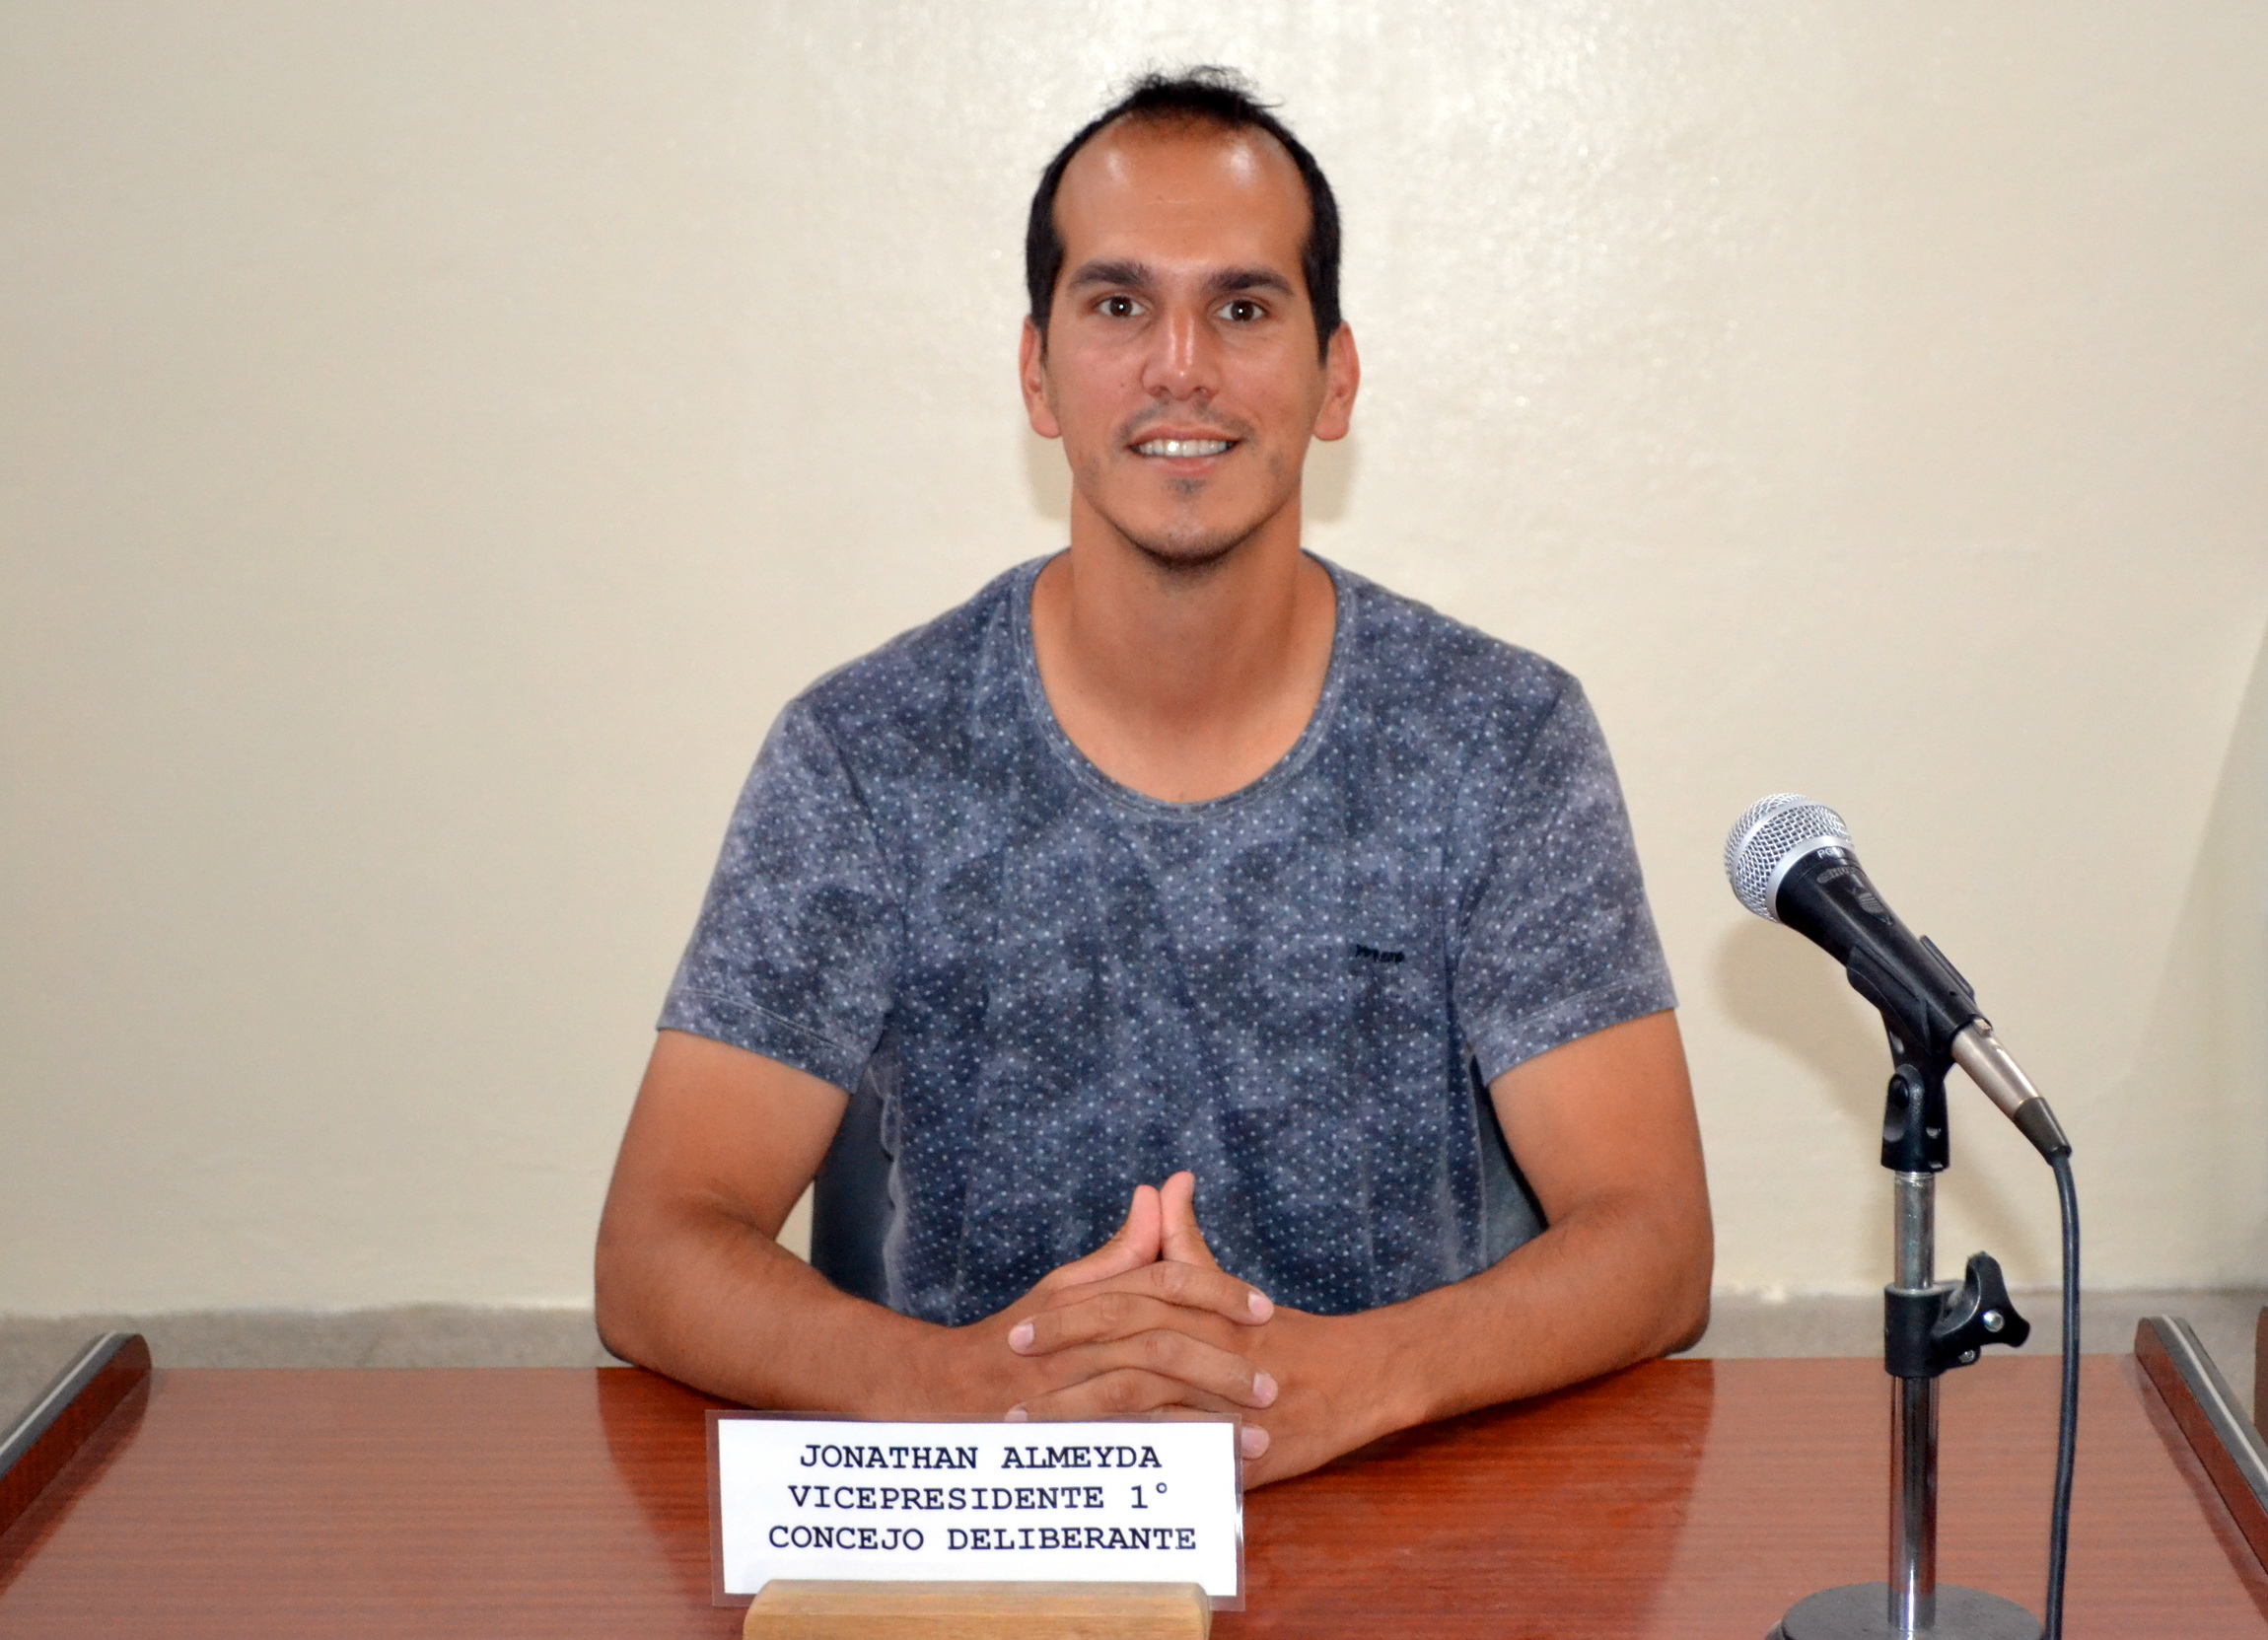 Jonathan Almeyda